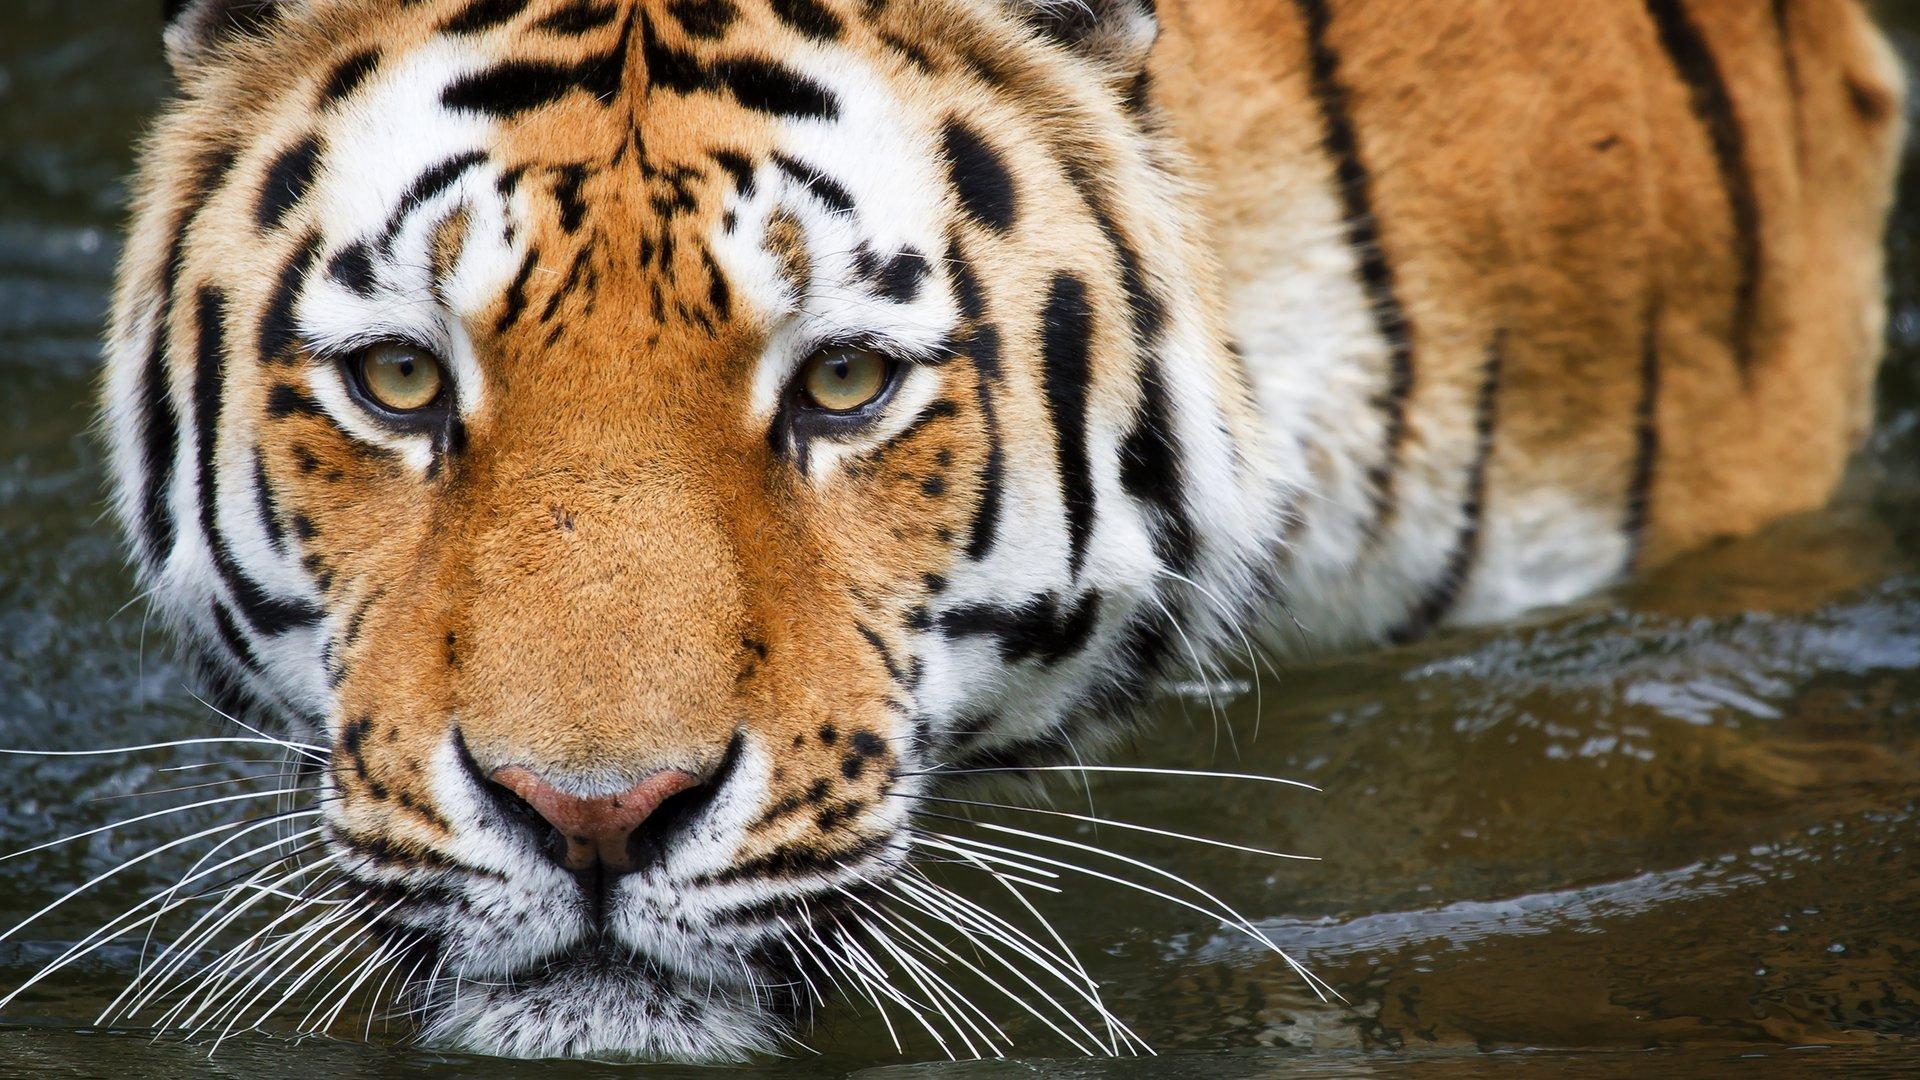 Wallpaper Cheetah Pair Hd Animals 6057: [43+] 1920X1080 Tiger Wallpaper Full HD On WallpaperSafari